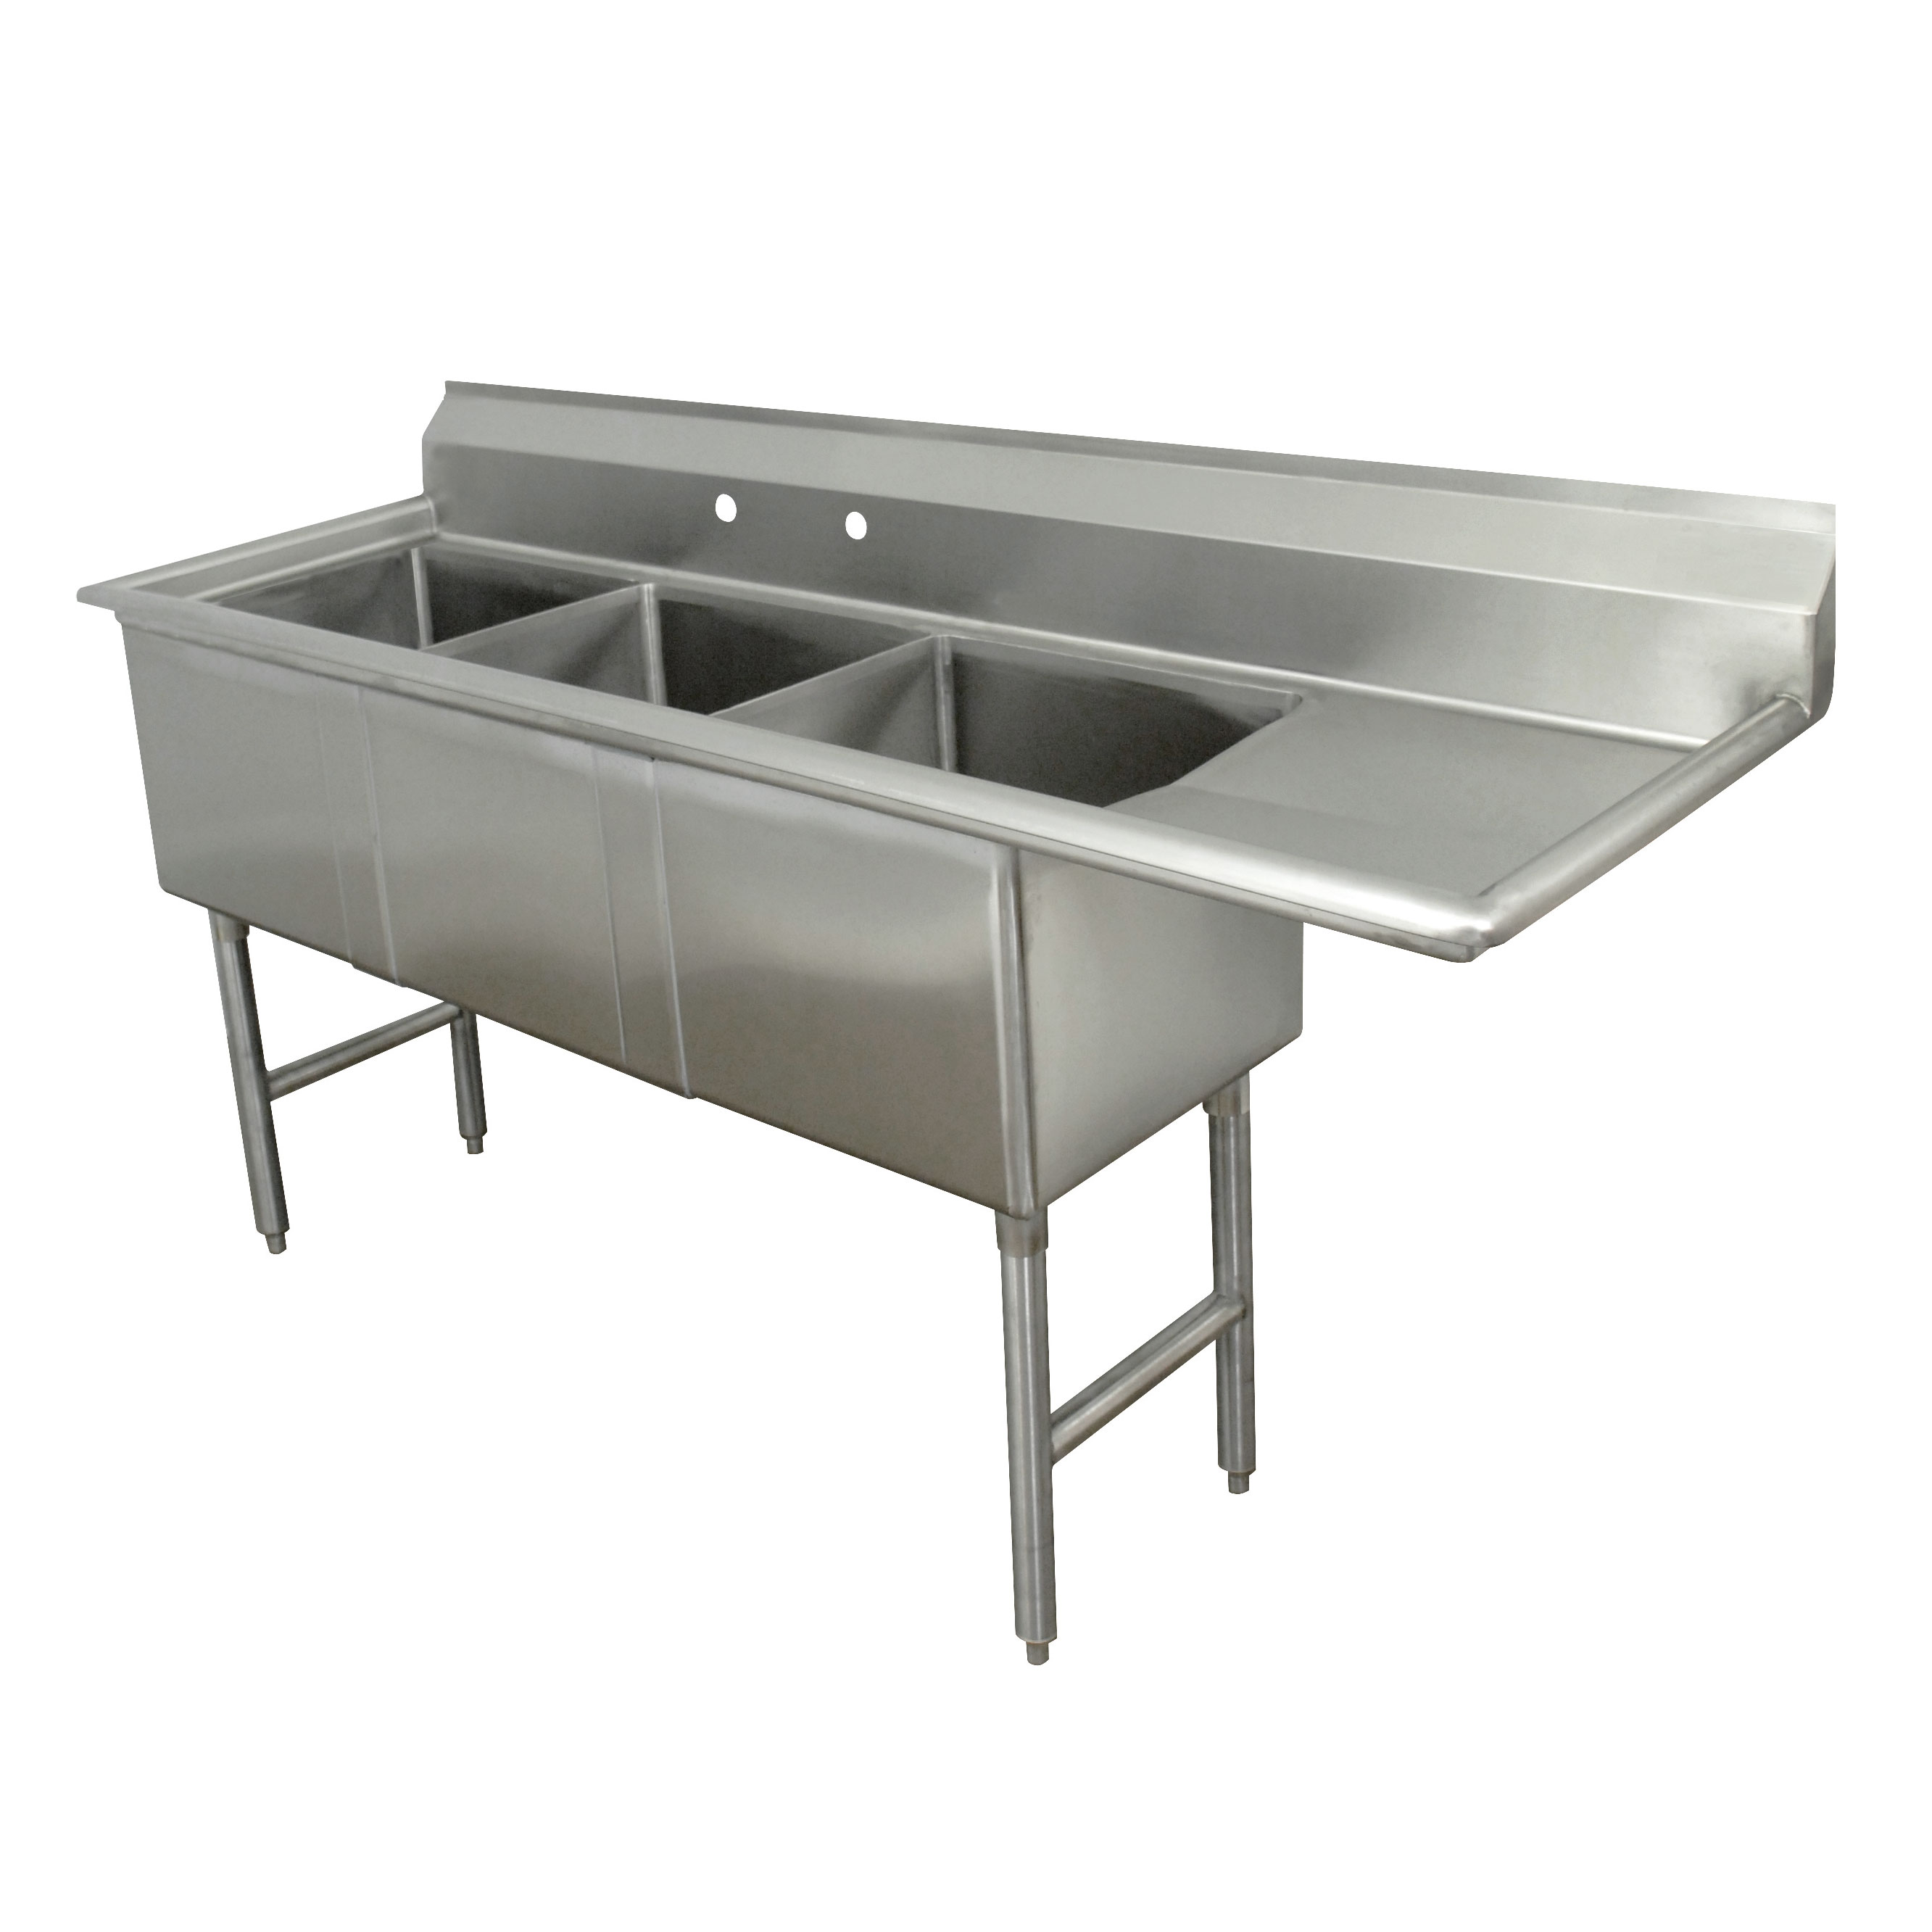 Advance Tabco FC-3-3024-30R sink, (3) three compartment